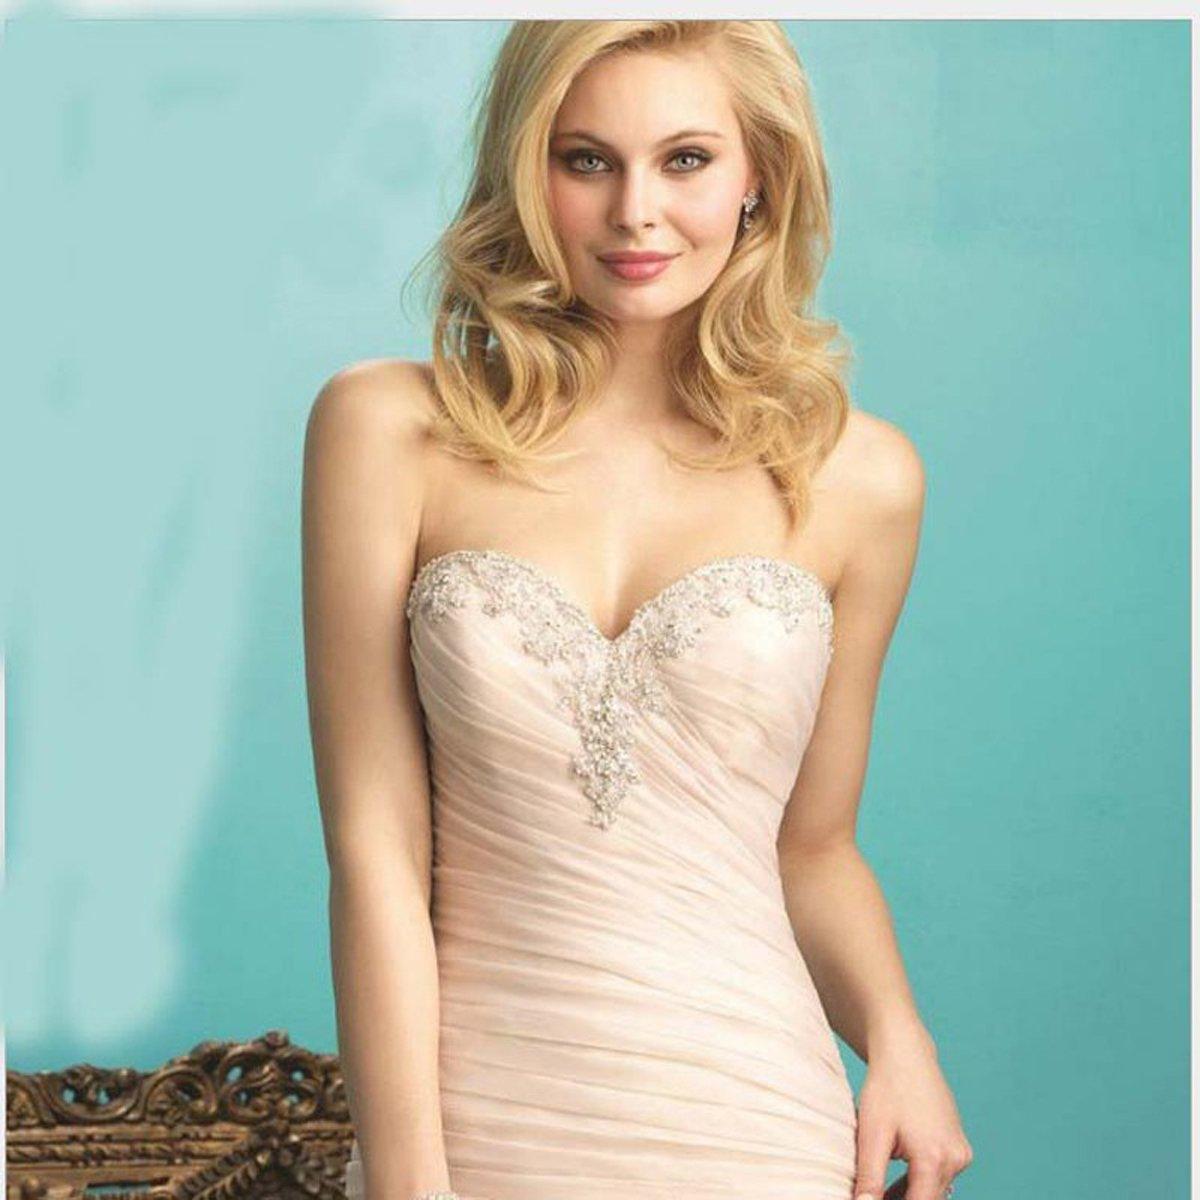 Angel Formal Dresses Women's Sweetheart Applique Beaded Mermaid Ruffles Tulle Wedding Dresses Gown(18,Ivory) by Angel Formal Dresses (Image #2)